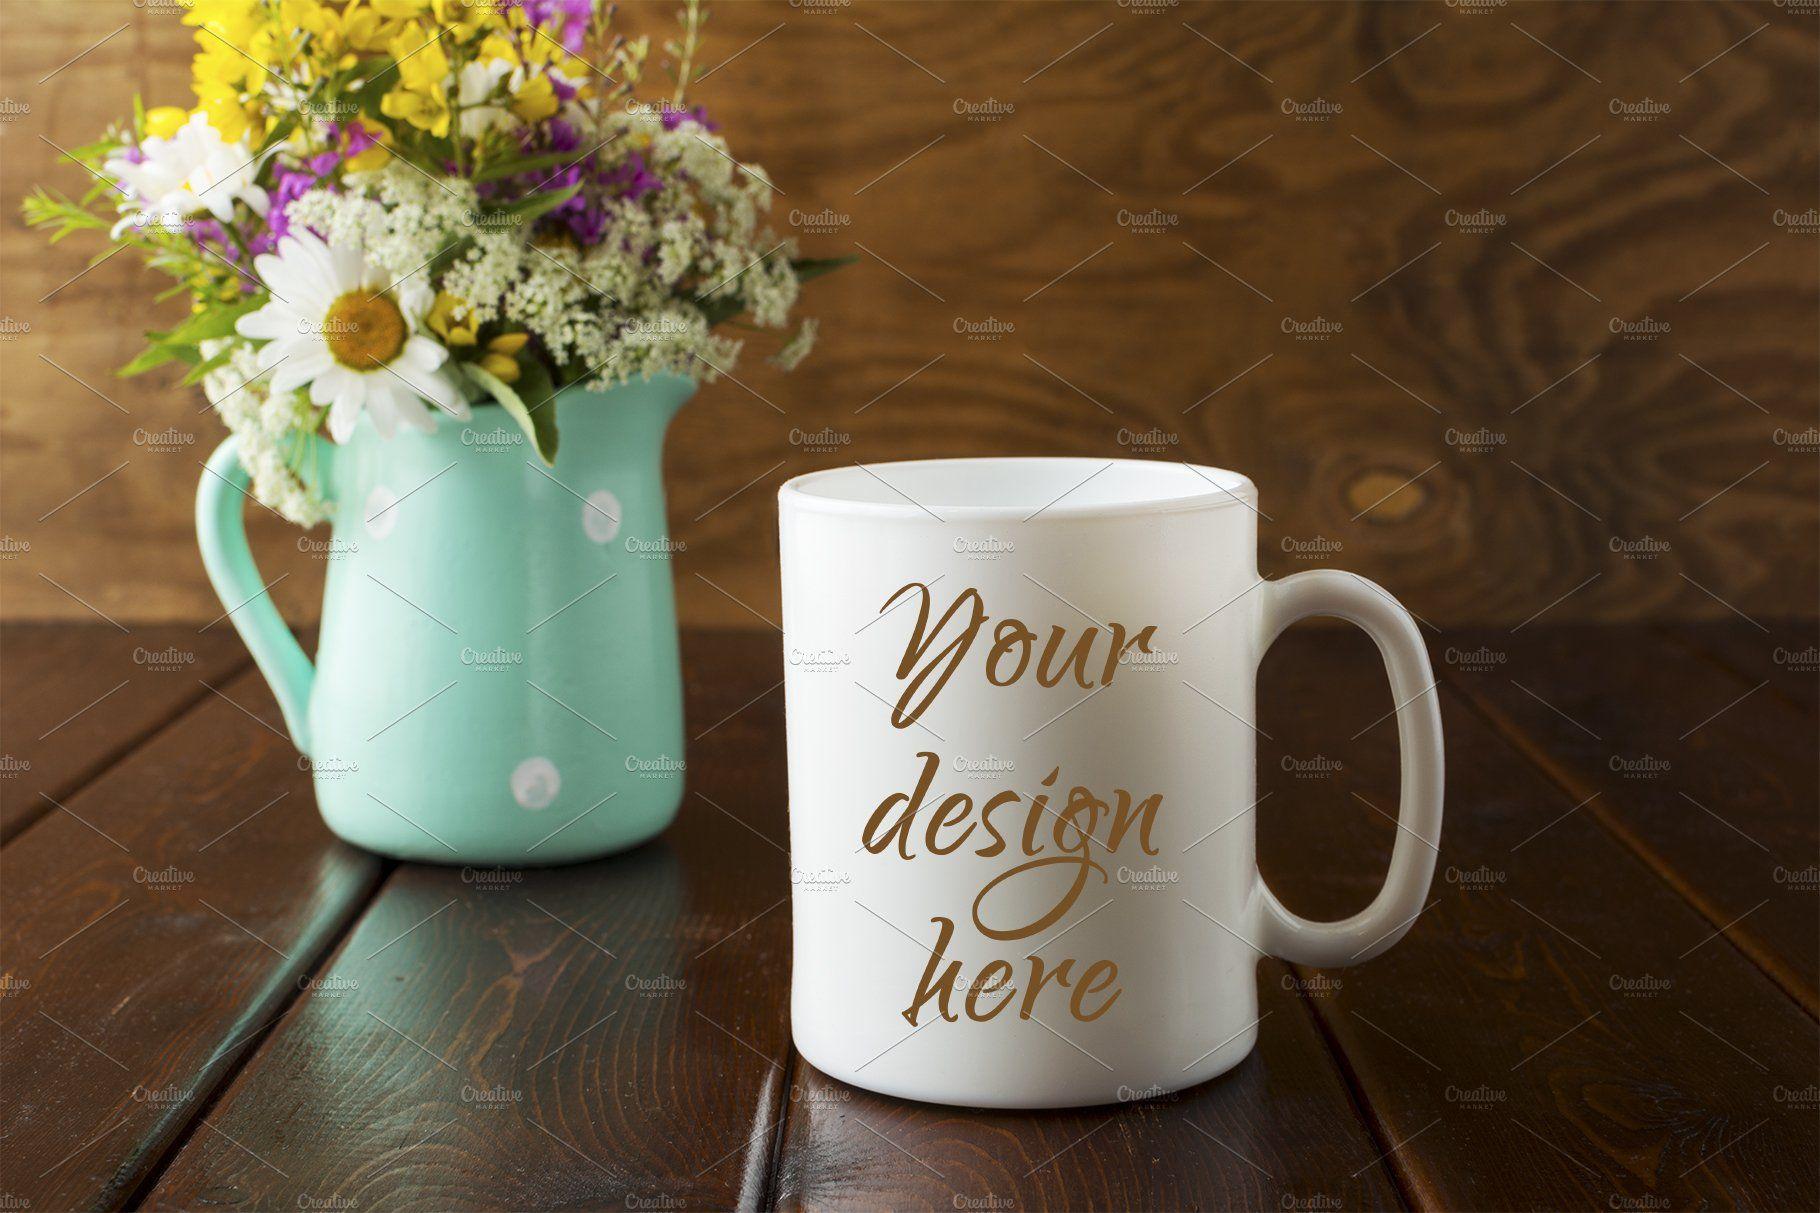 White coffee mug rustic mockup with White coffee mugs